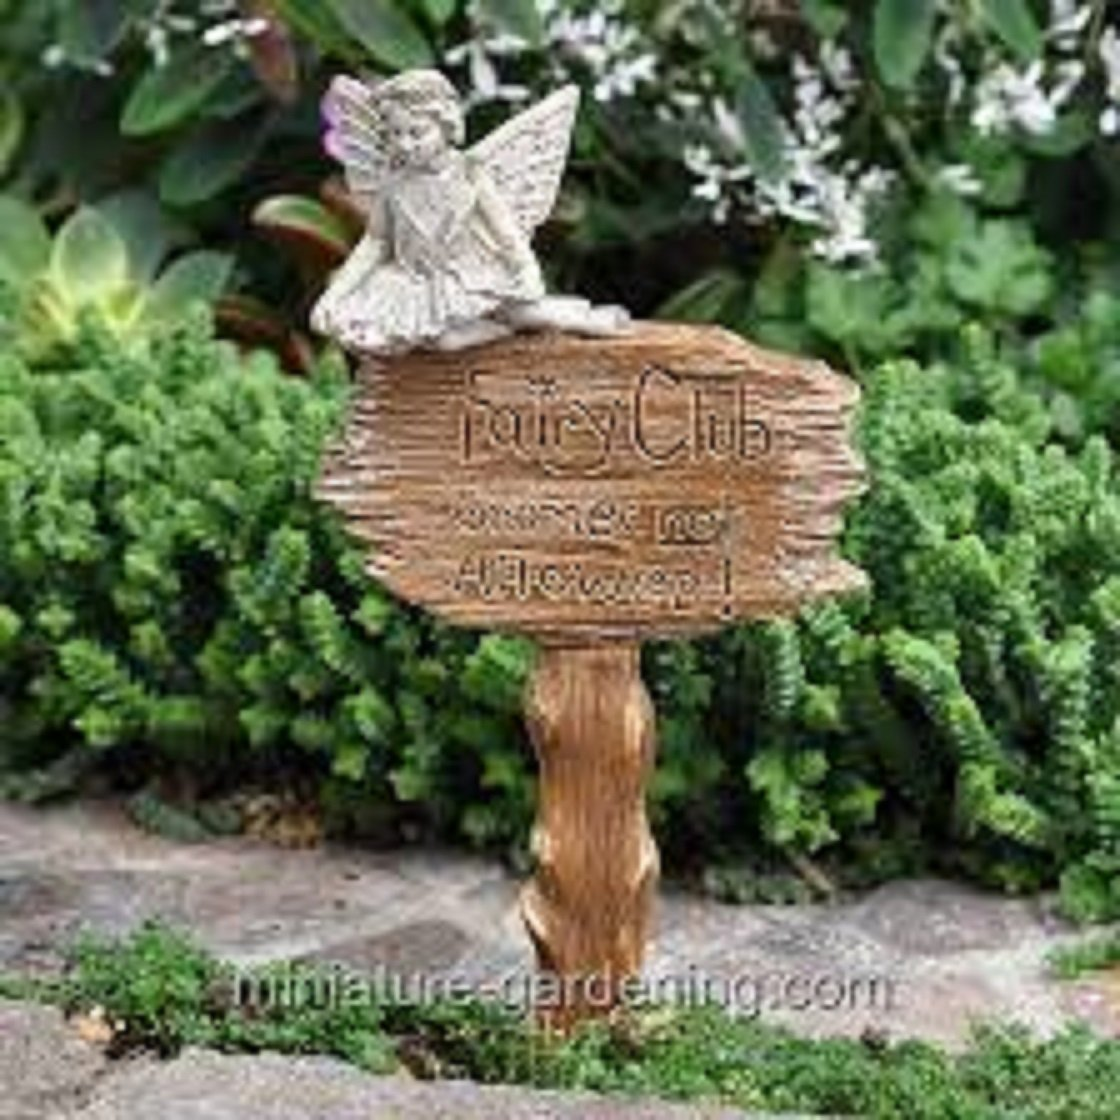 Amazon.com: Miniature Fairy Garden Club Sign Gnomes not Allowed ...